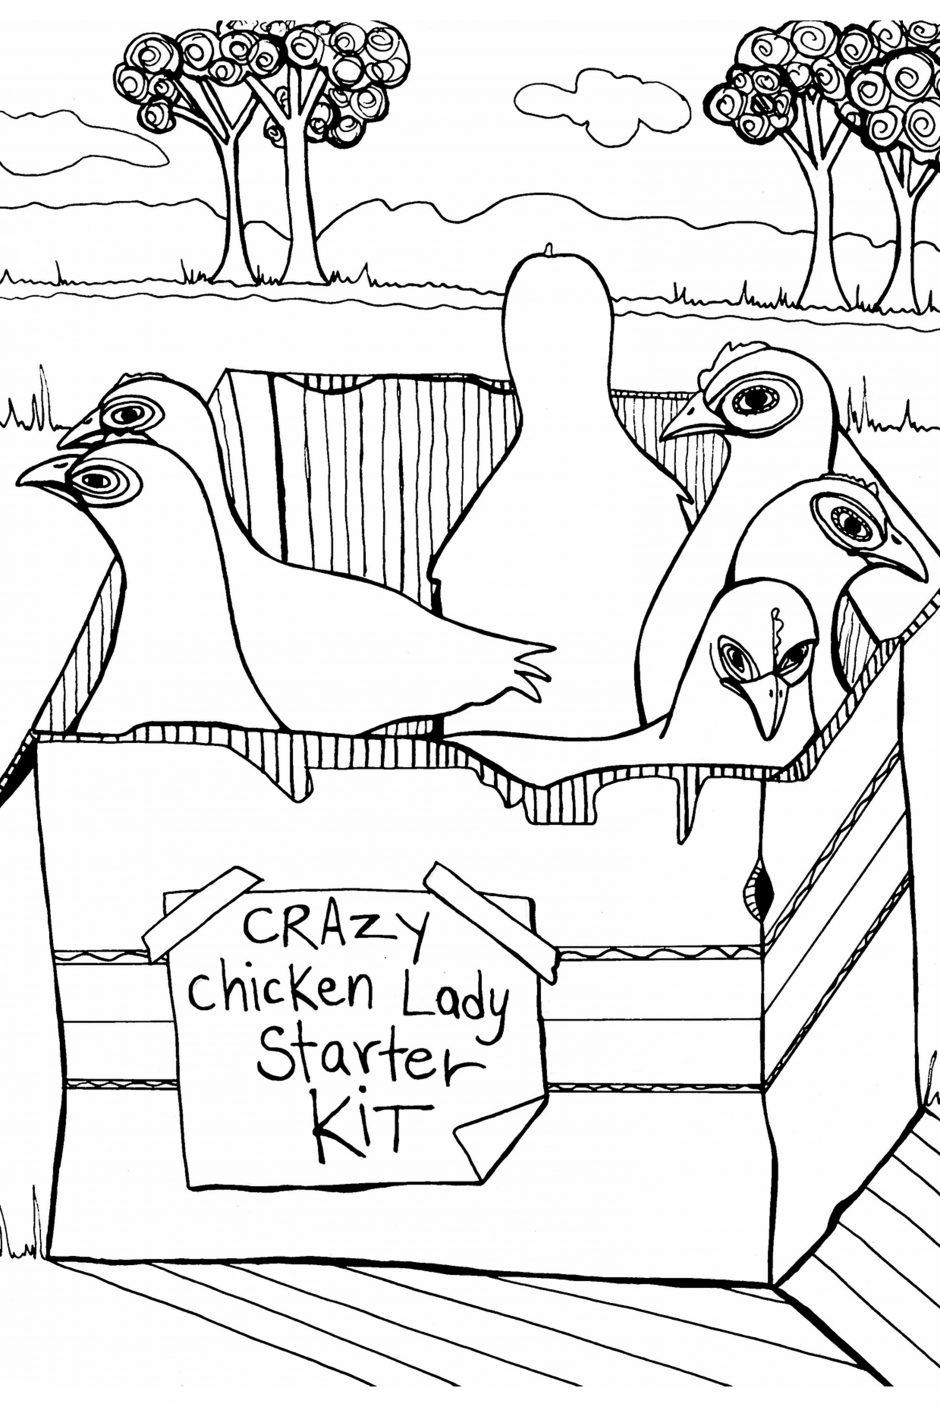 creative chicken coloring book